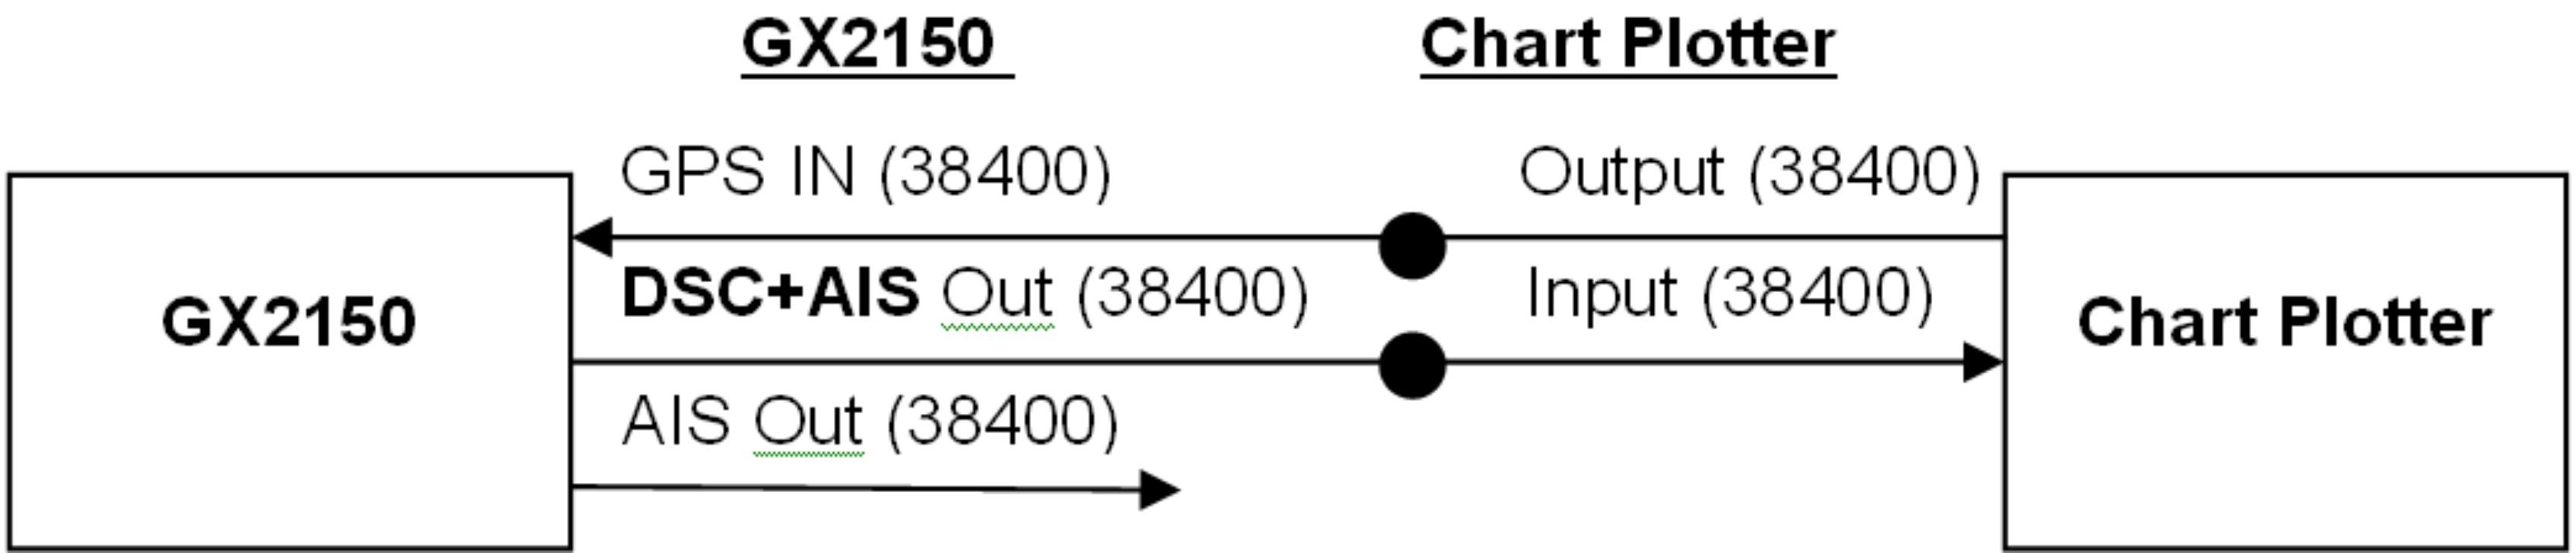 International 424 Wiring Diagram International 424 Carburetor – International 444 Wiring Diagram